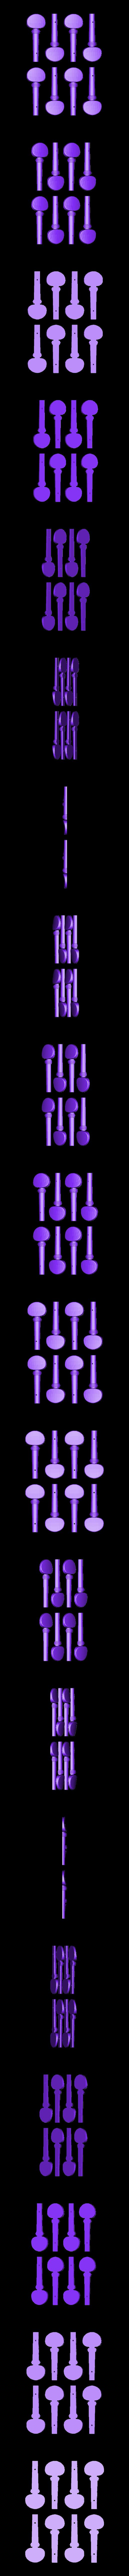 16a-pegs-4x-split.stl Download free STL file Violin • 3D print design, jteix